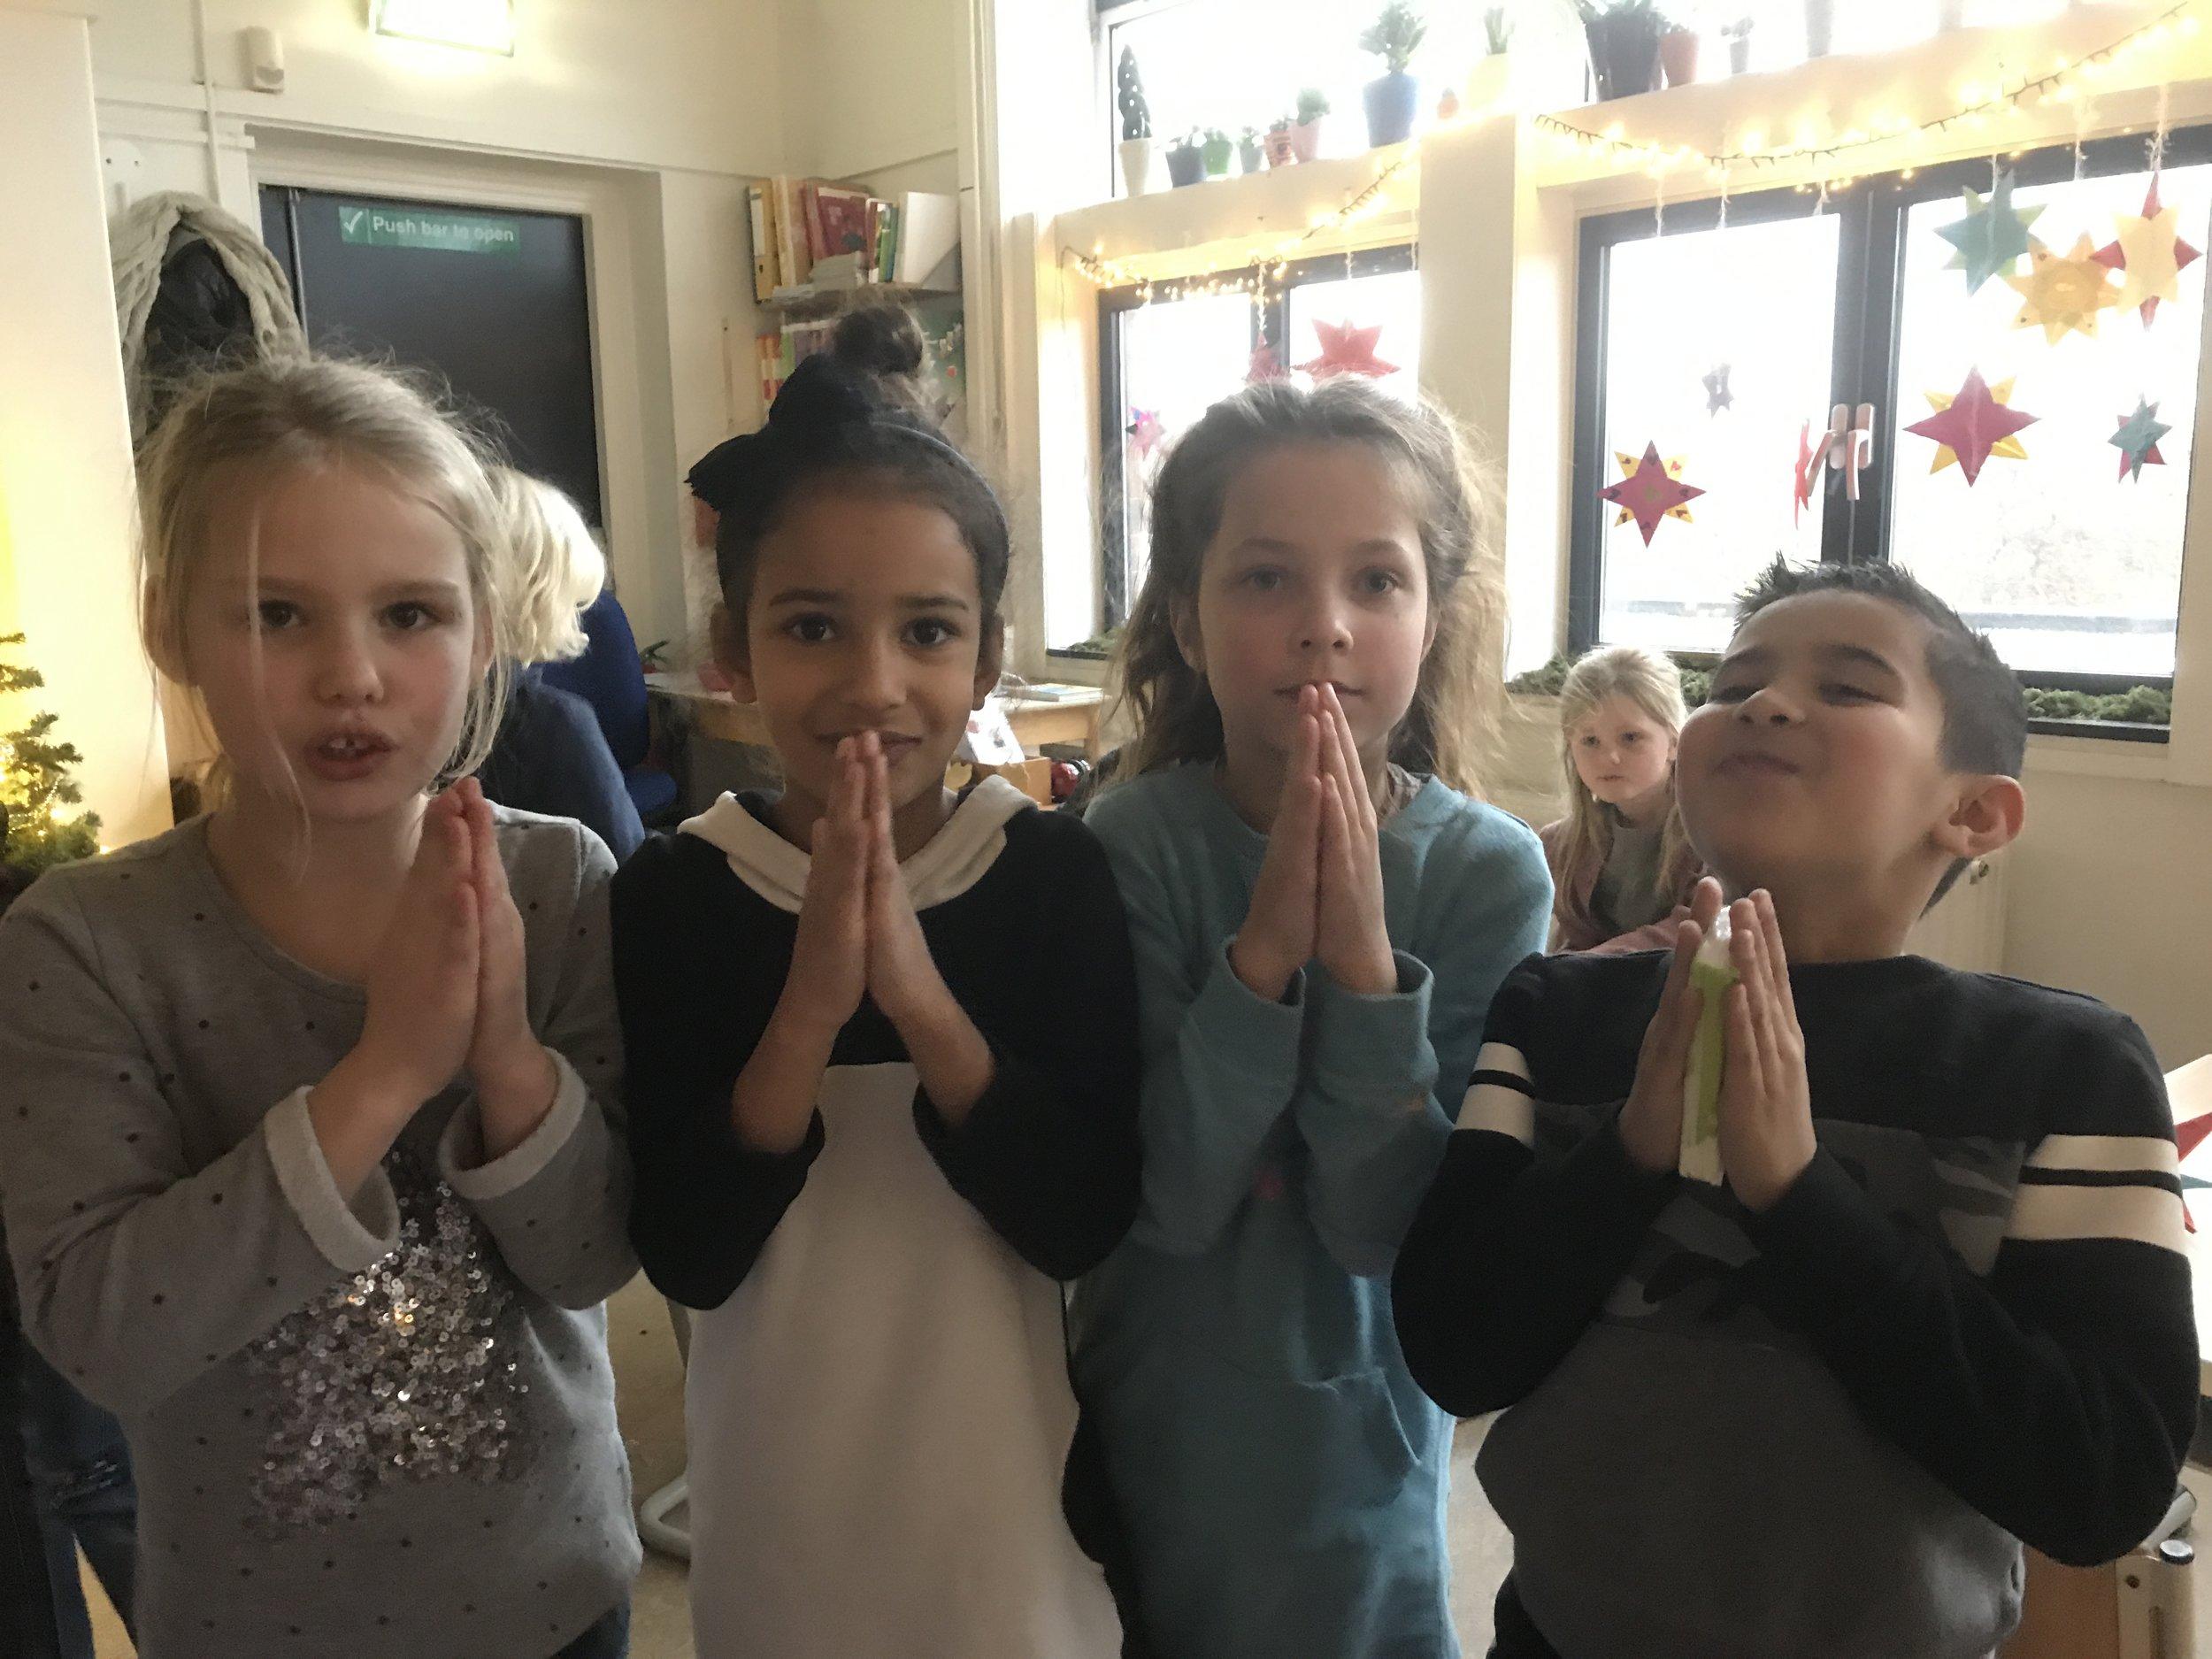 A heart-warming Namasté from the Dutch children for Nepal